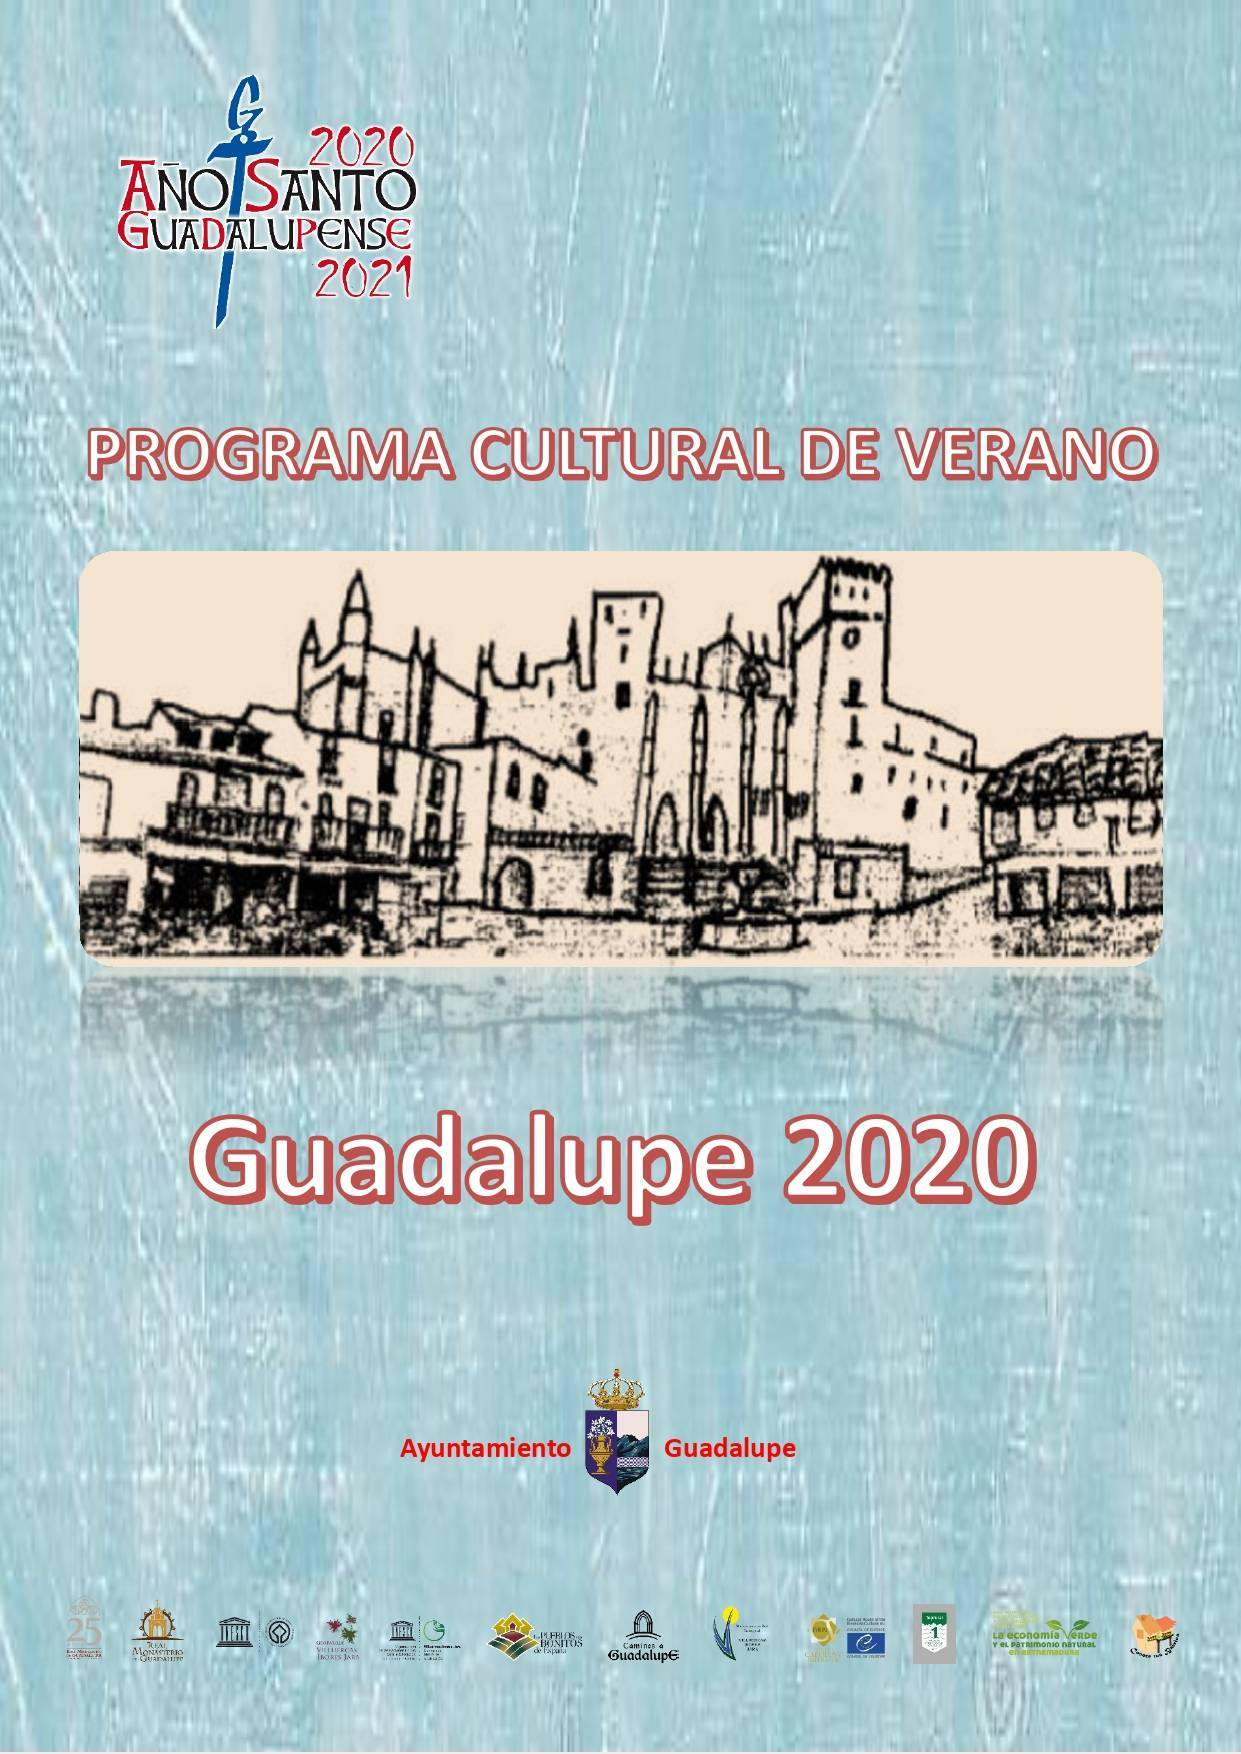 Programa cultural de verano 2020 - Guadalupe (Cáceres) 1